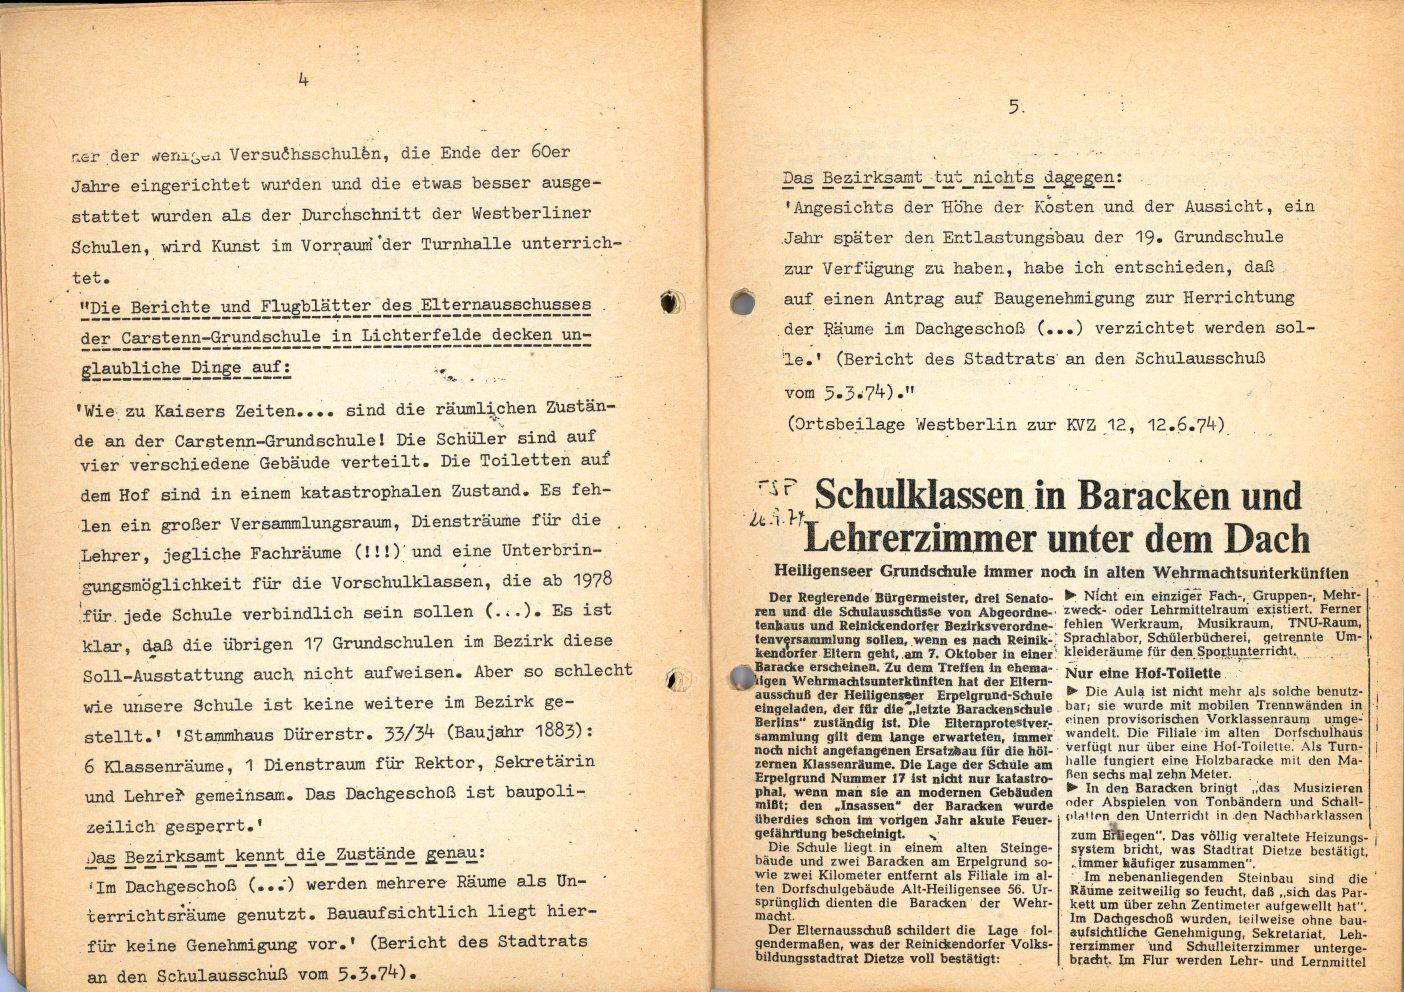 Berlin_SMV_GUV_1974_Schulmisere_05